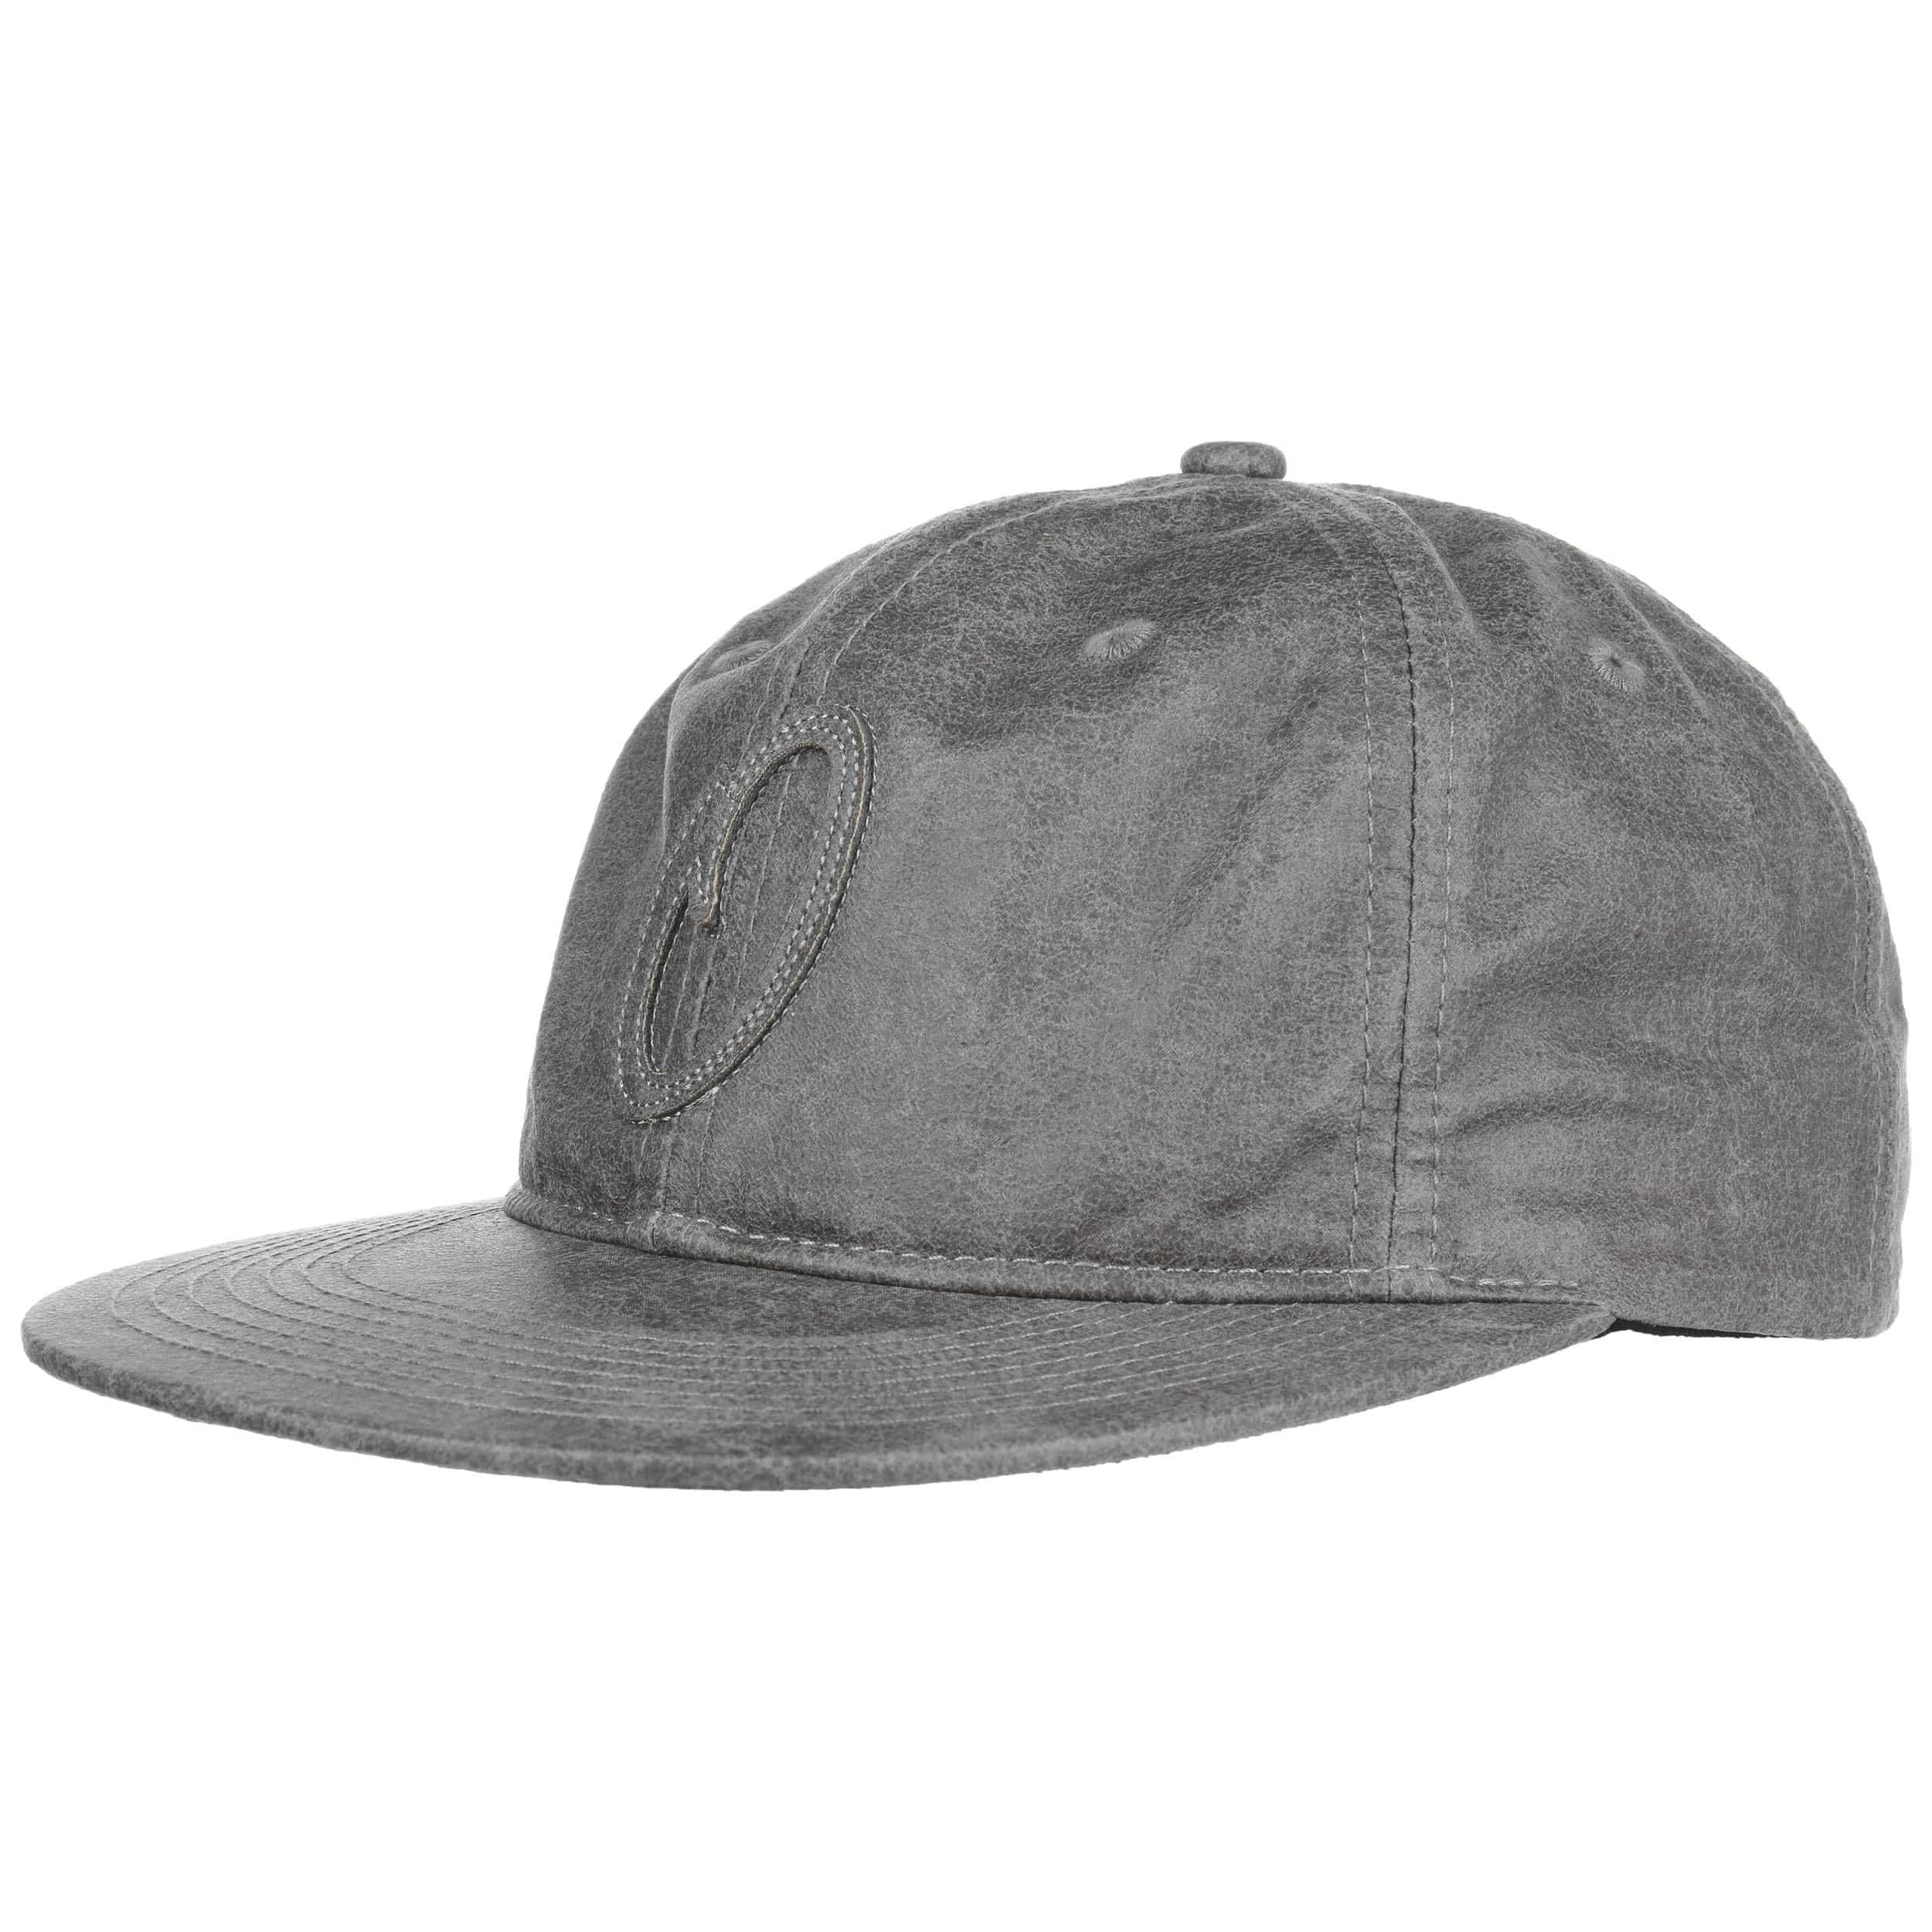 330121870cd ... Suede Pitch Strapback Cap by Official Headwear - dark grey 5